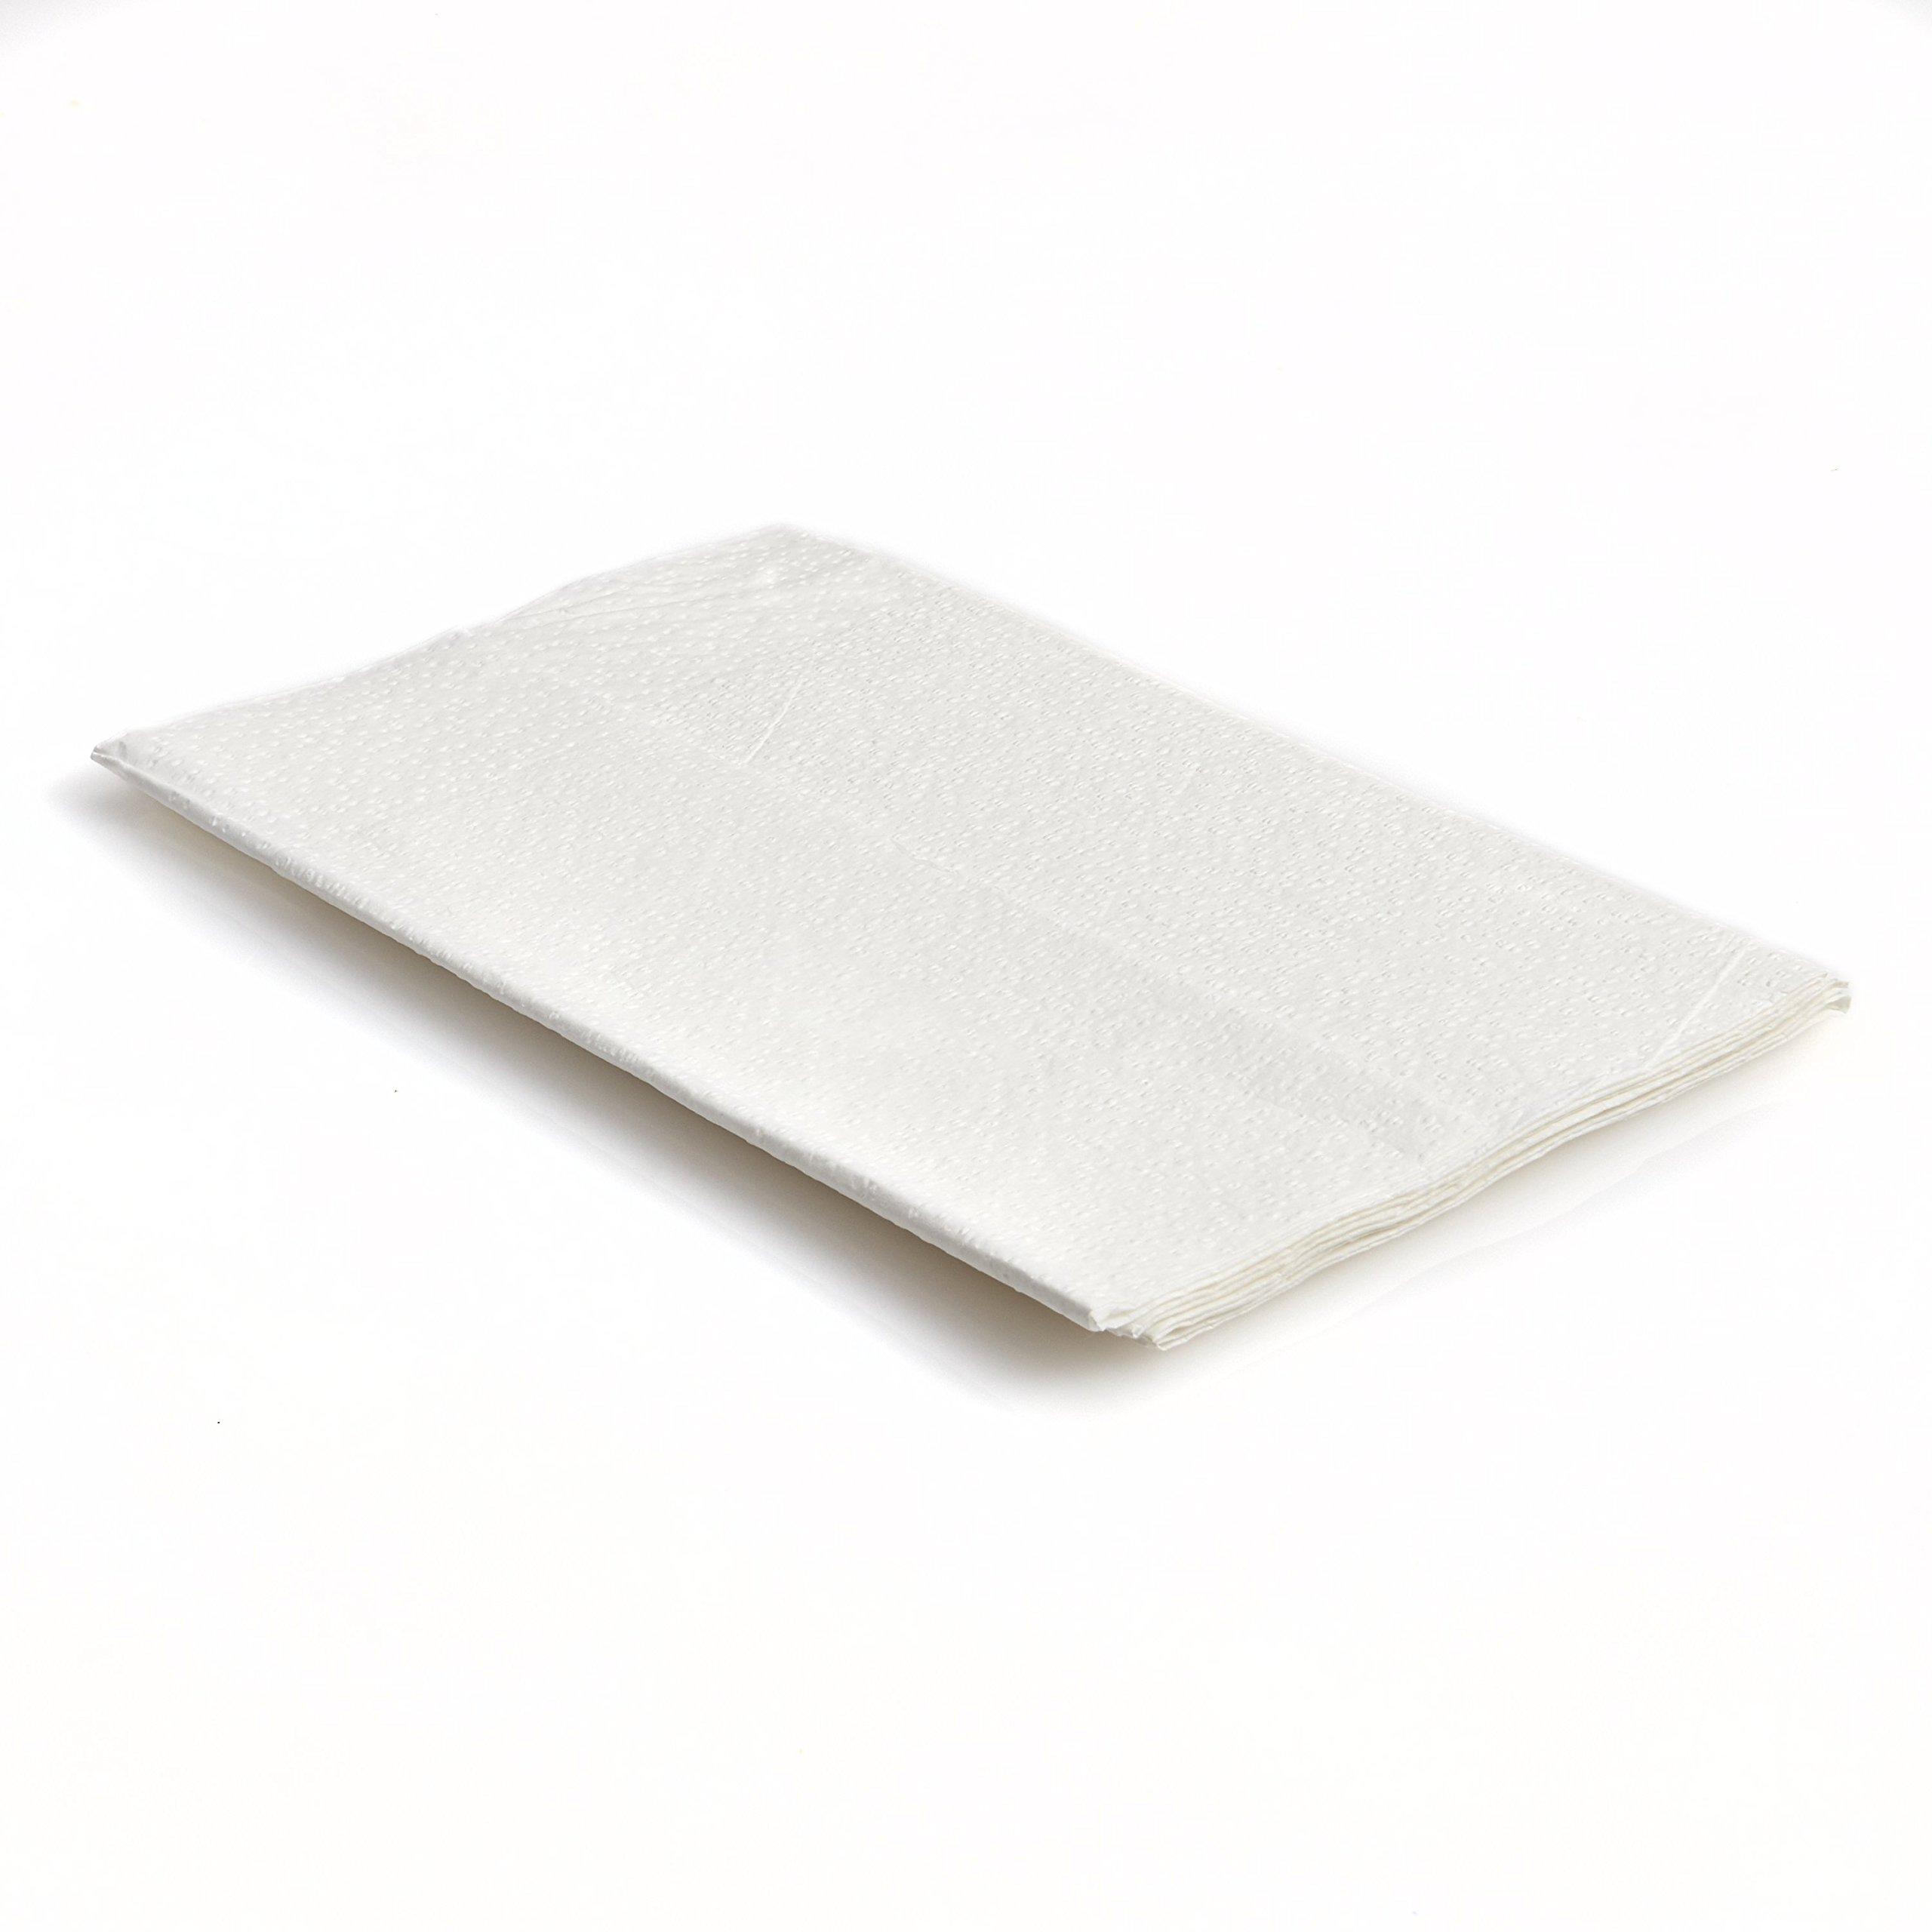 Graham Medical 70309N Drape Sheet, 2 Ply, 36''w x 60''l, Fanfold (Pack of 100)